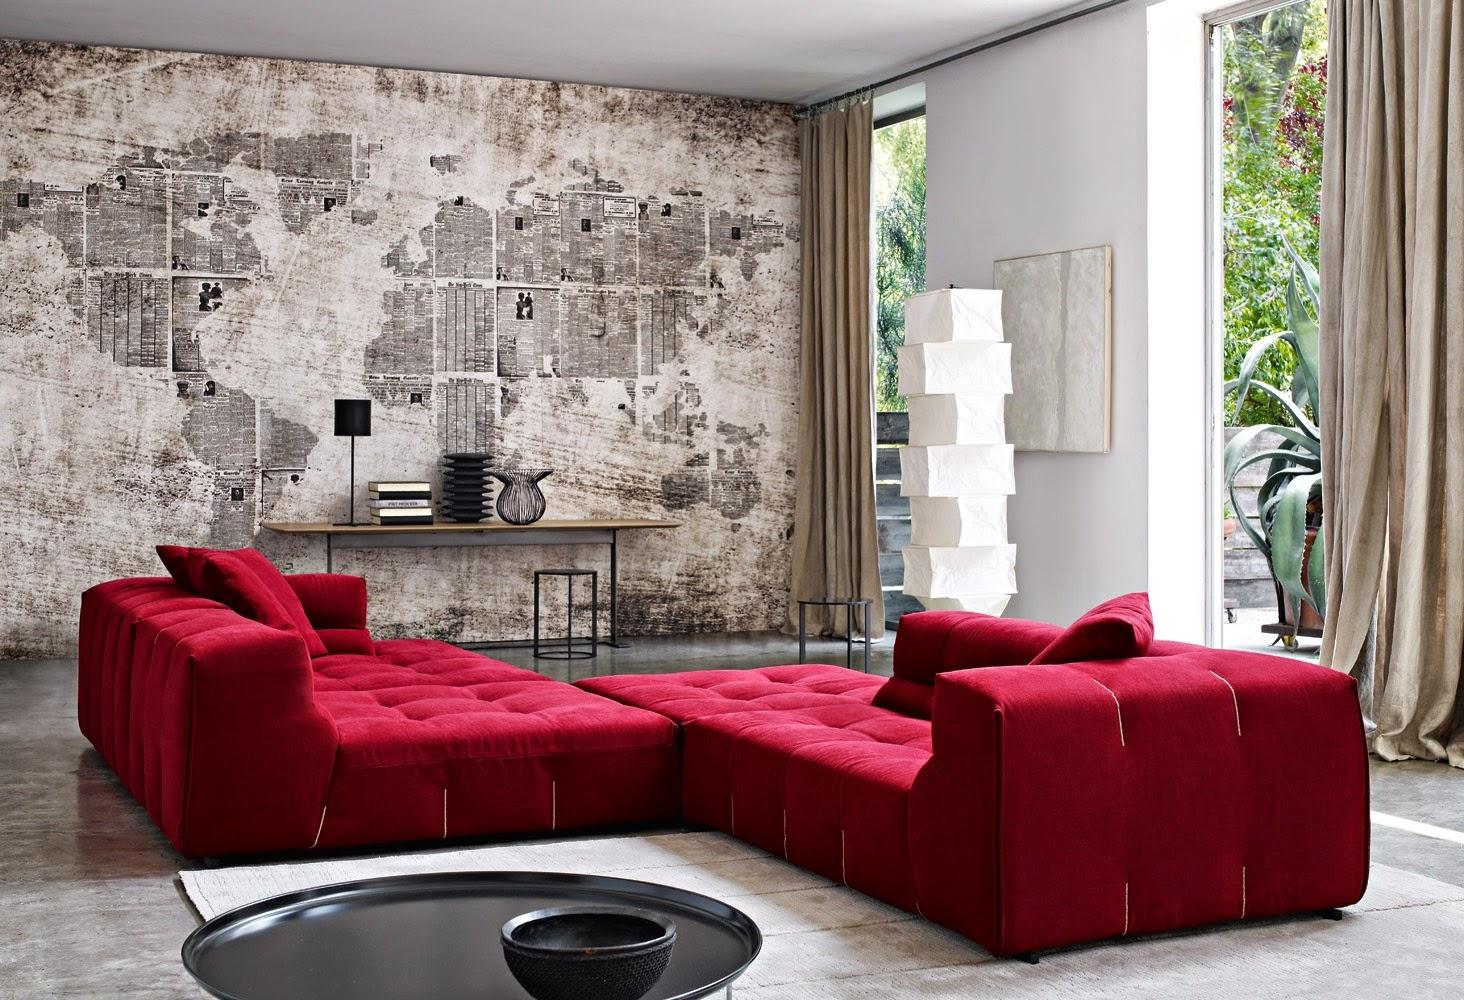 Sofa Ruang Keluarga Minimalis Bikin Interior Menarik